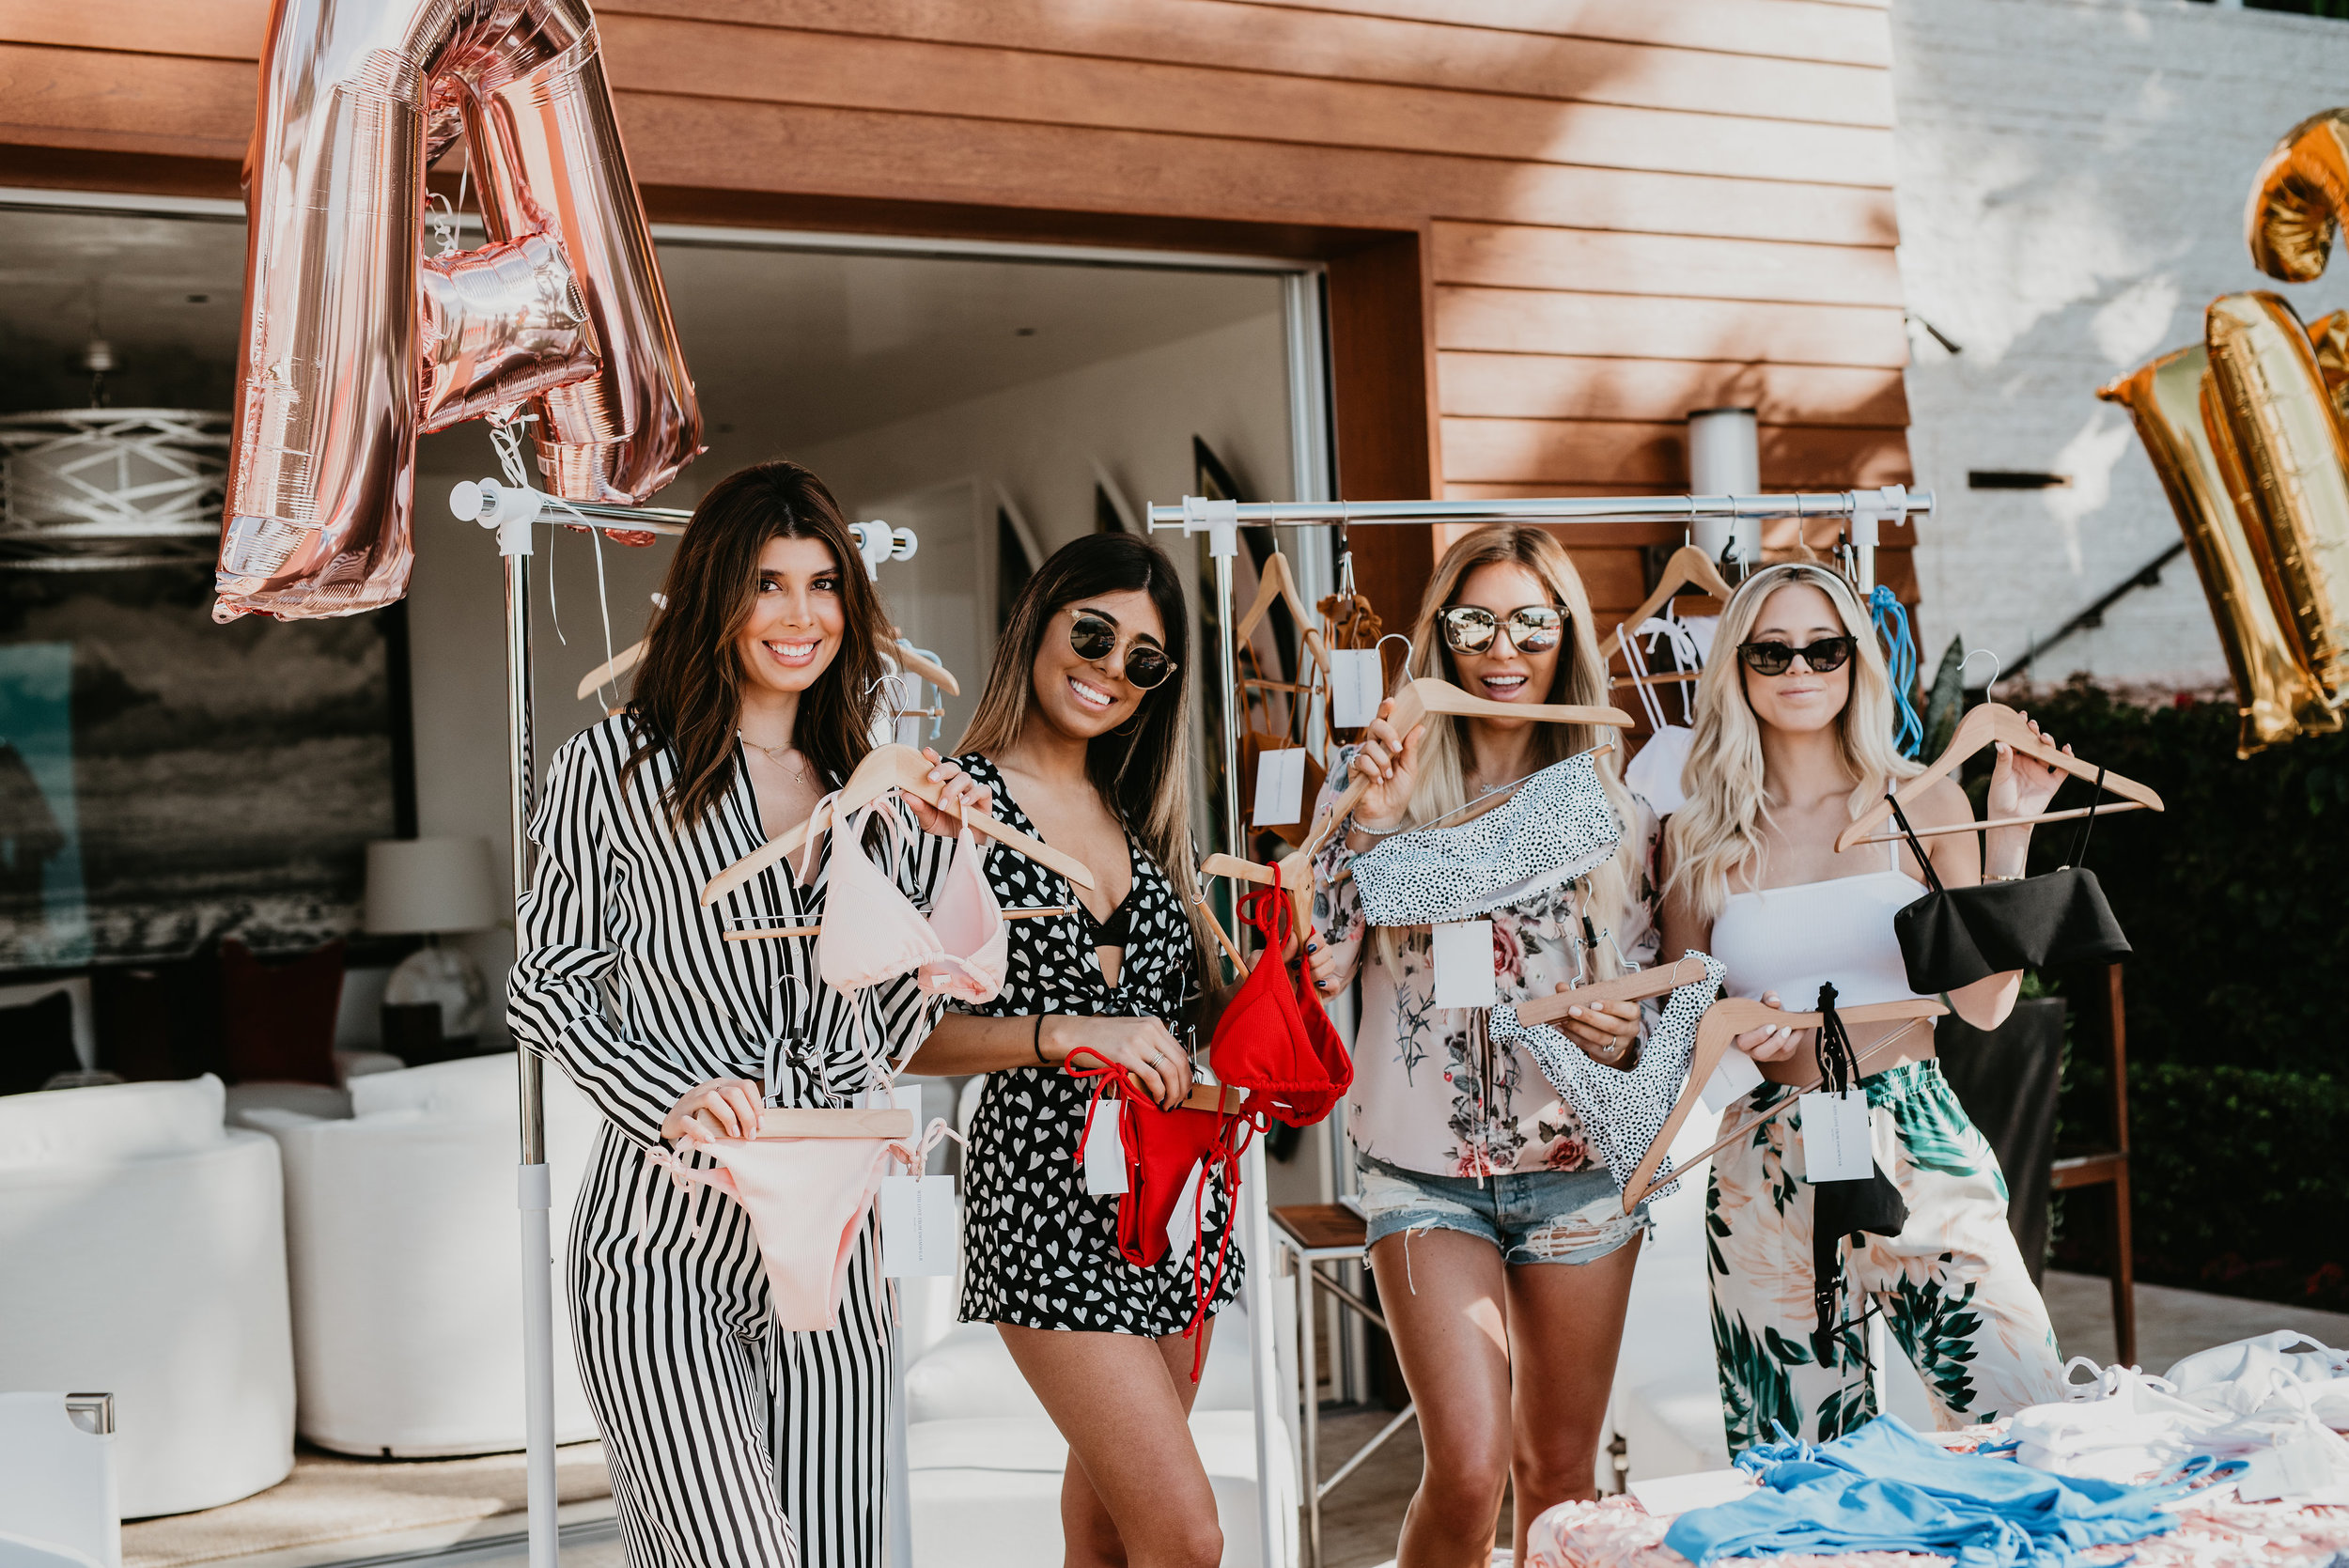 Laguna Beach bikini pop up shop featuring With Love From Swimwear, Shiva, and Lauren